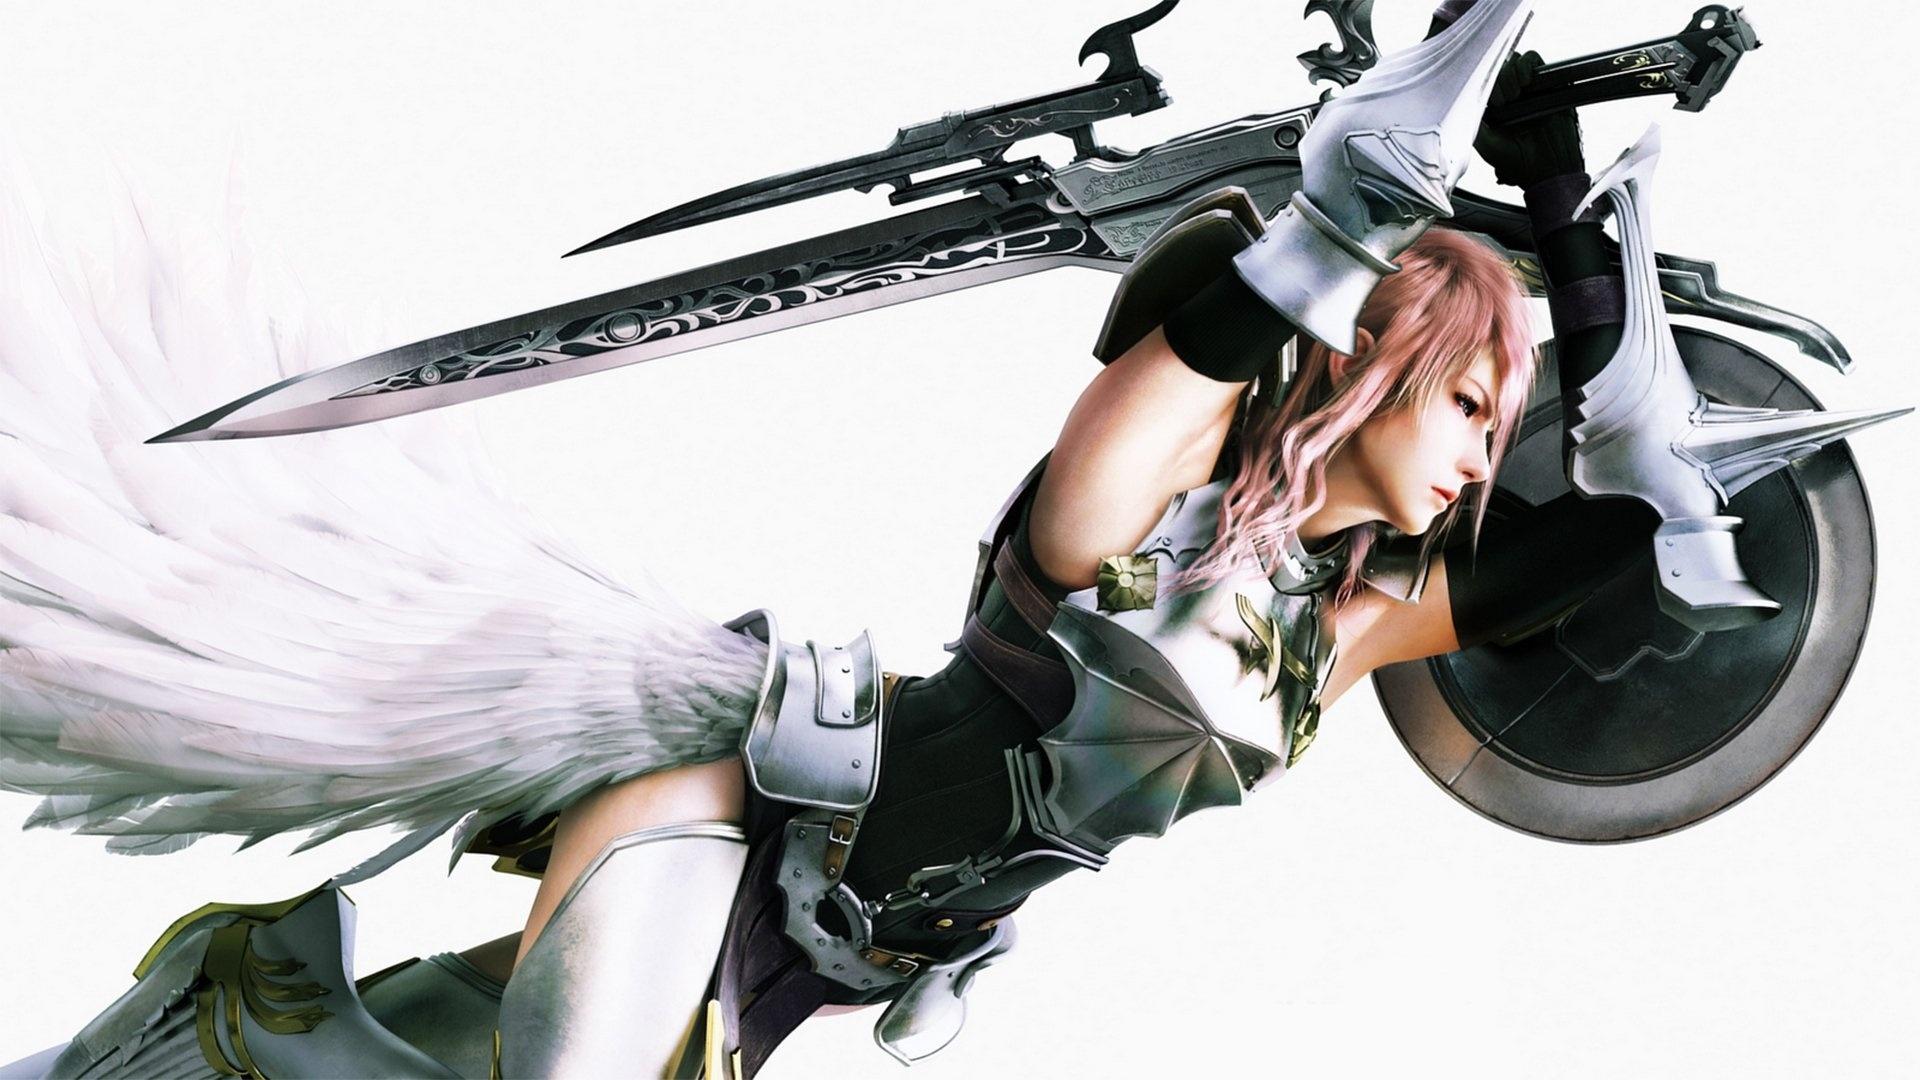 Final Fantasy free image